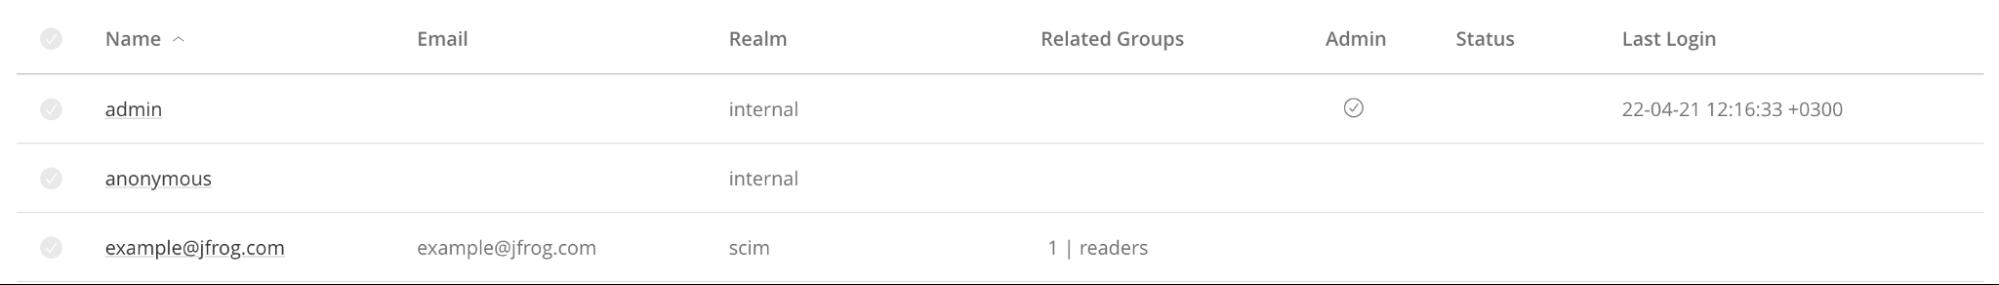 JFrog Platform Users page